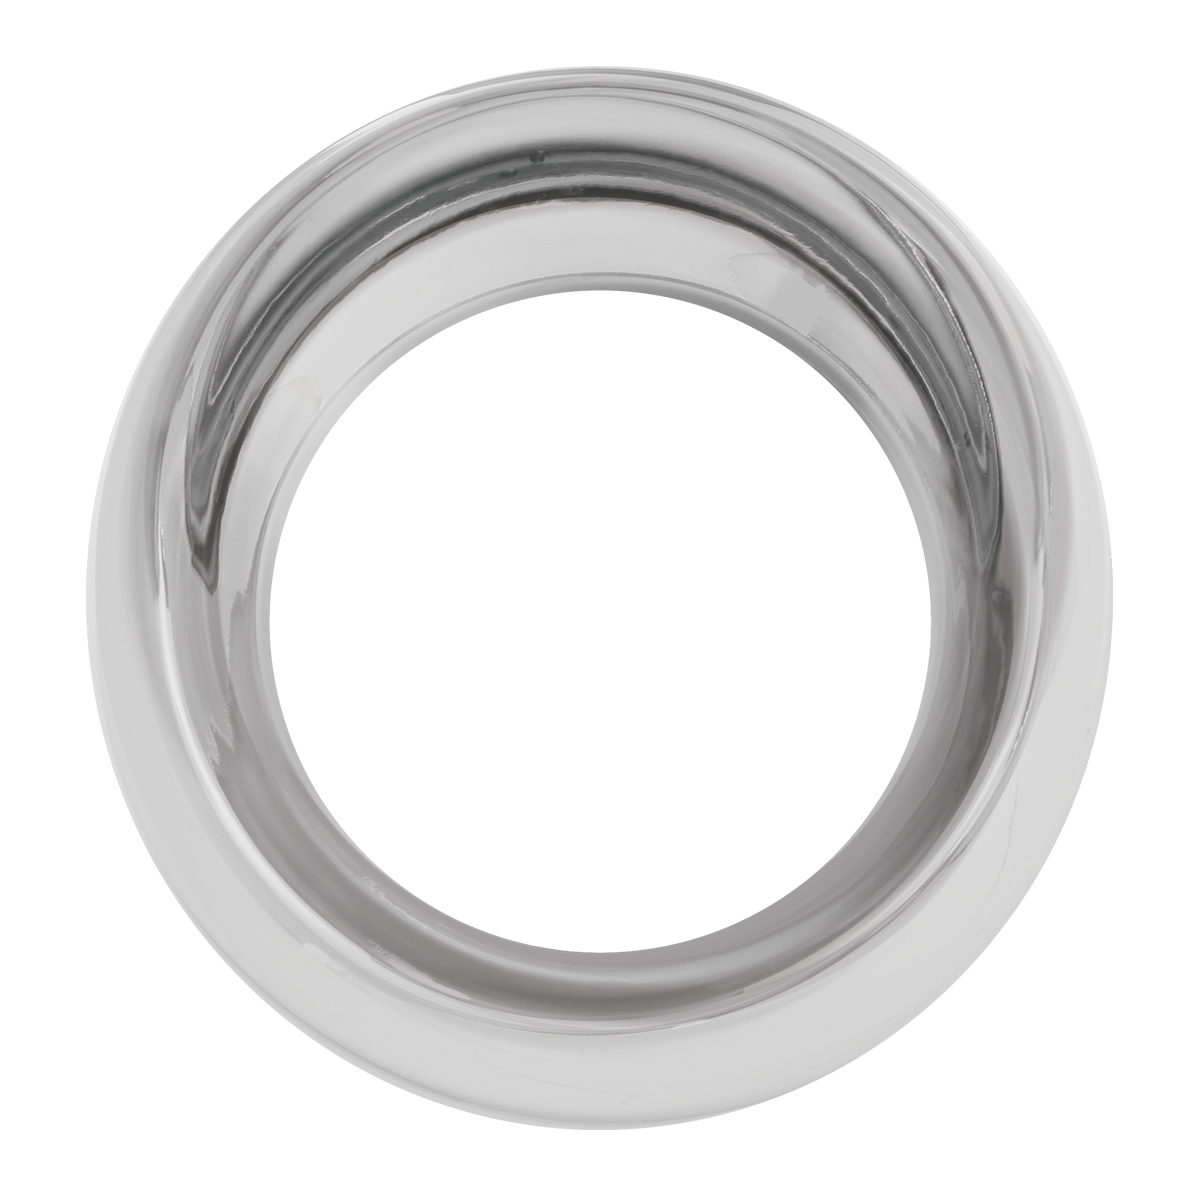 68398 Chrome Plastic Pyrometer Gauge Cover for Pete & FL